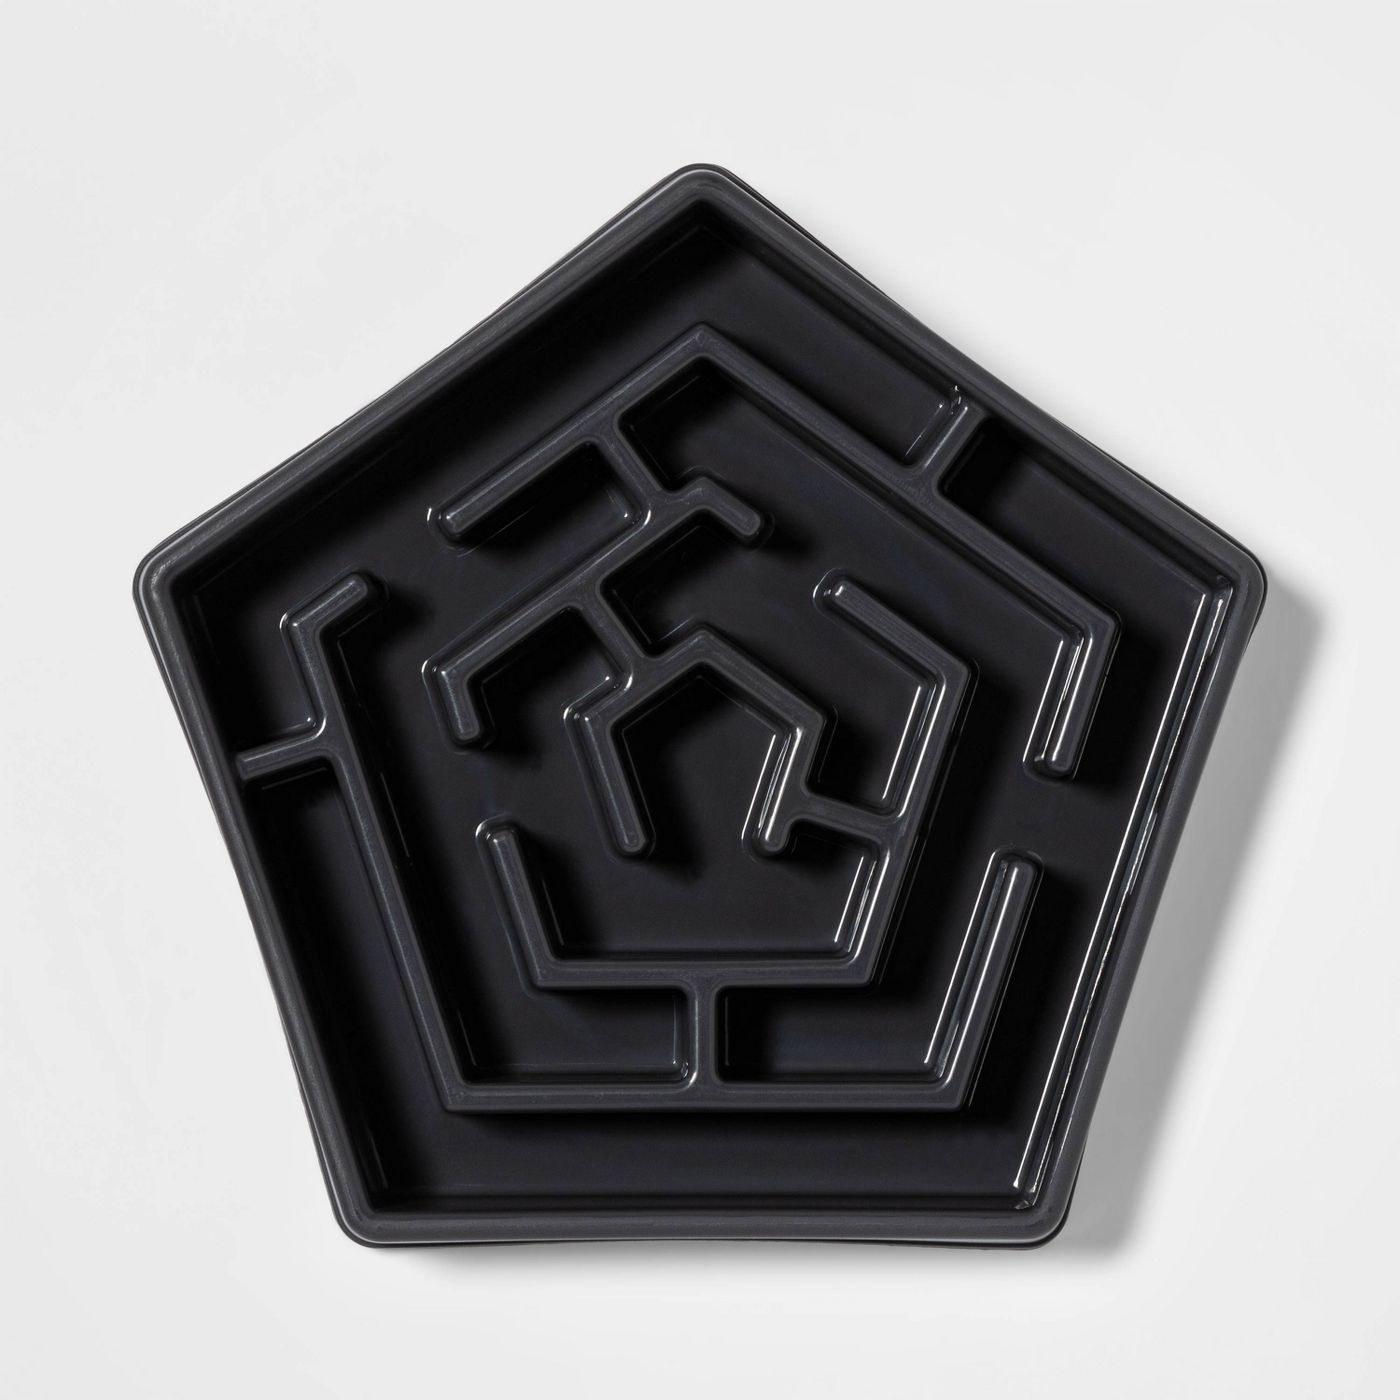 Dark gray pentagon-shaped food dish with ridges